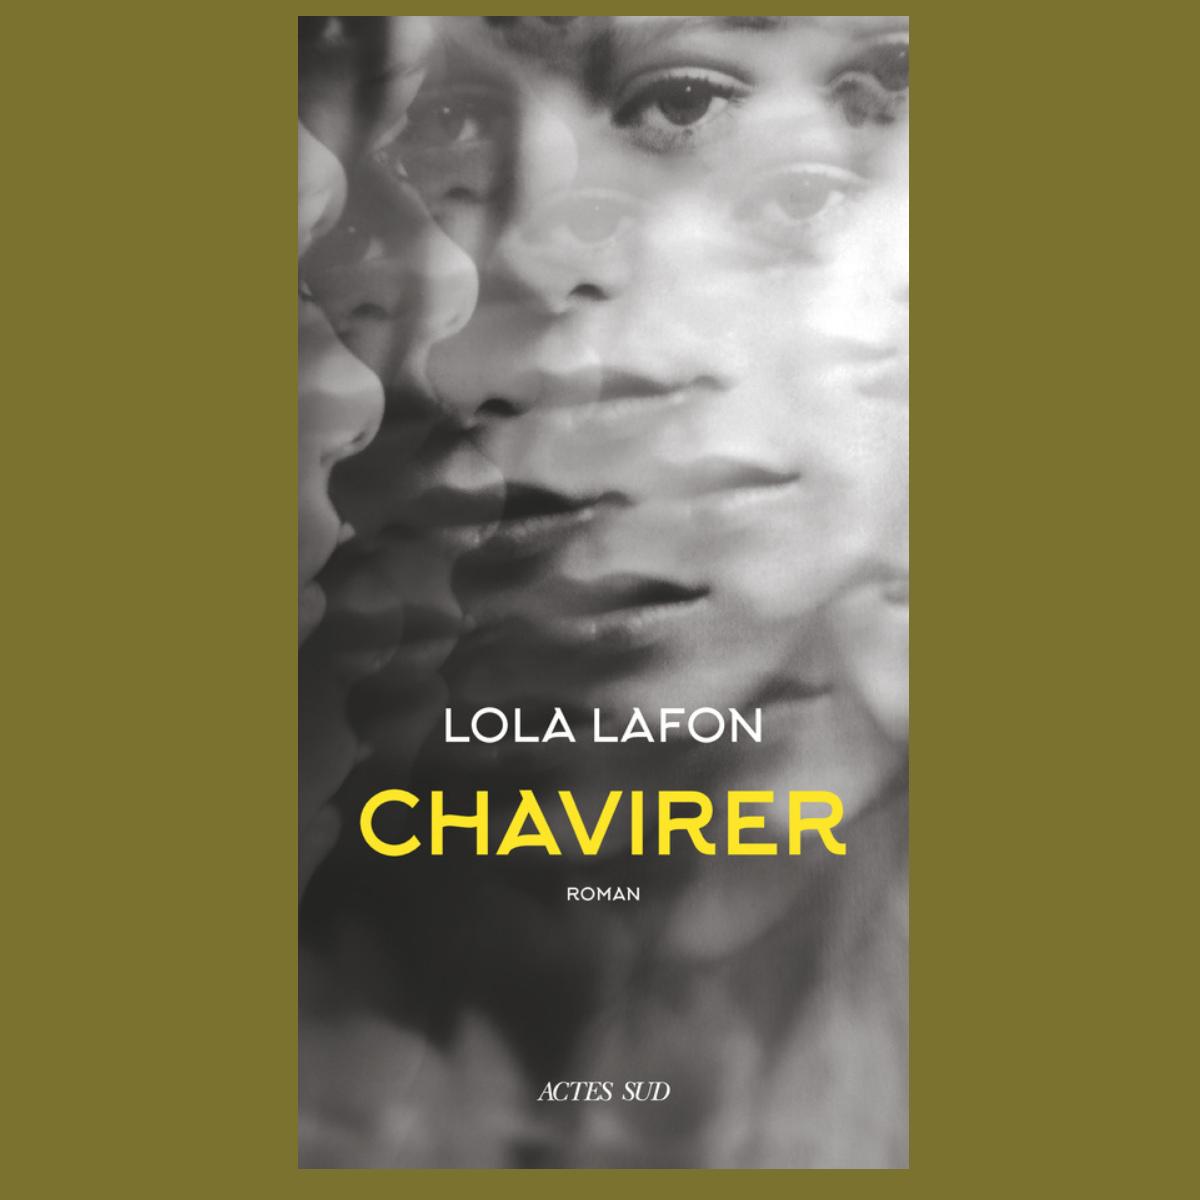 Chavirer - Lola Lafon (Actes Sud)